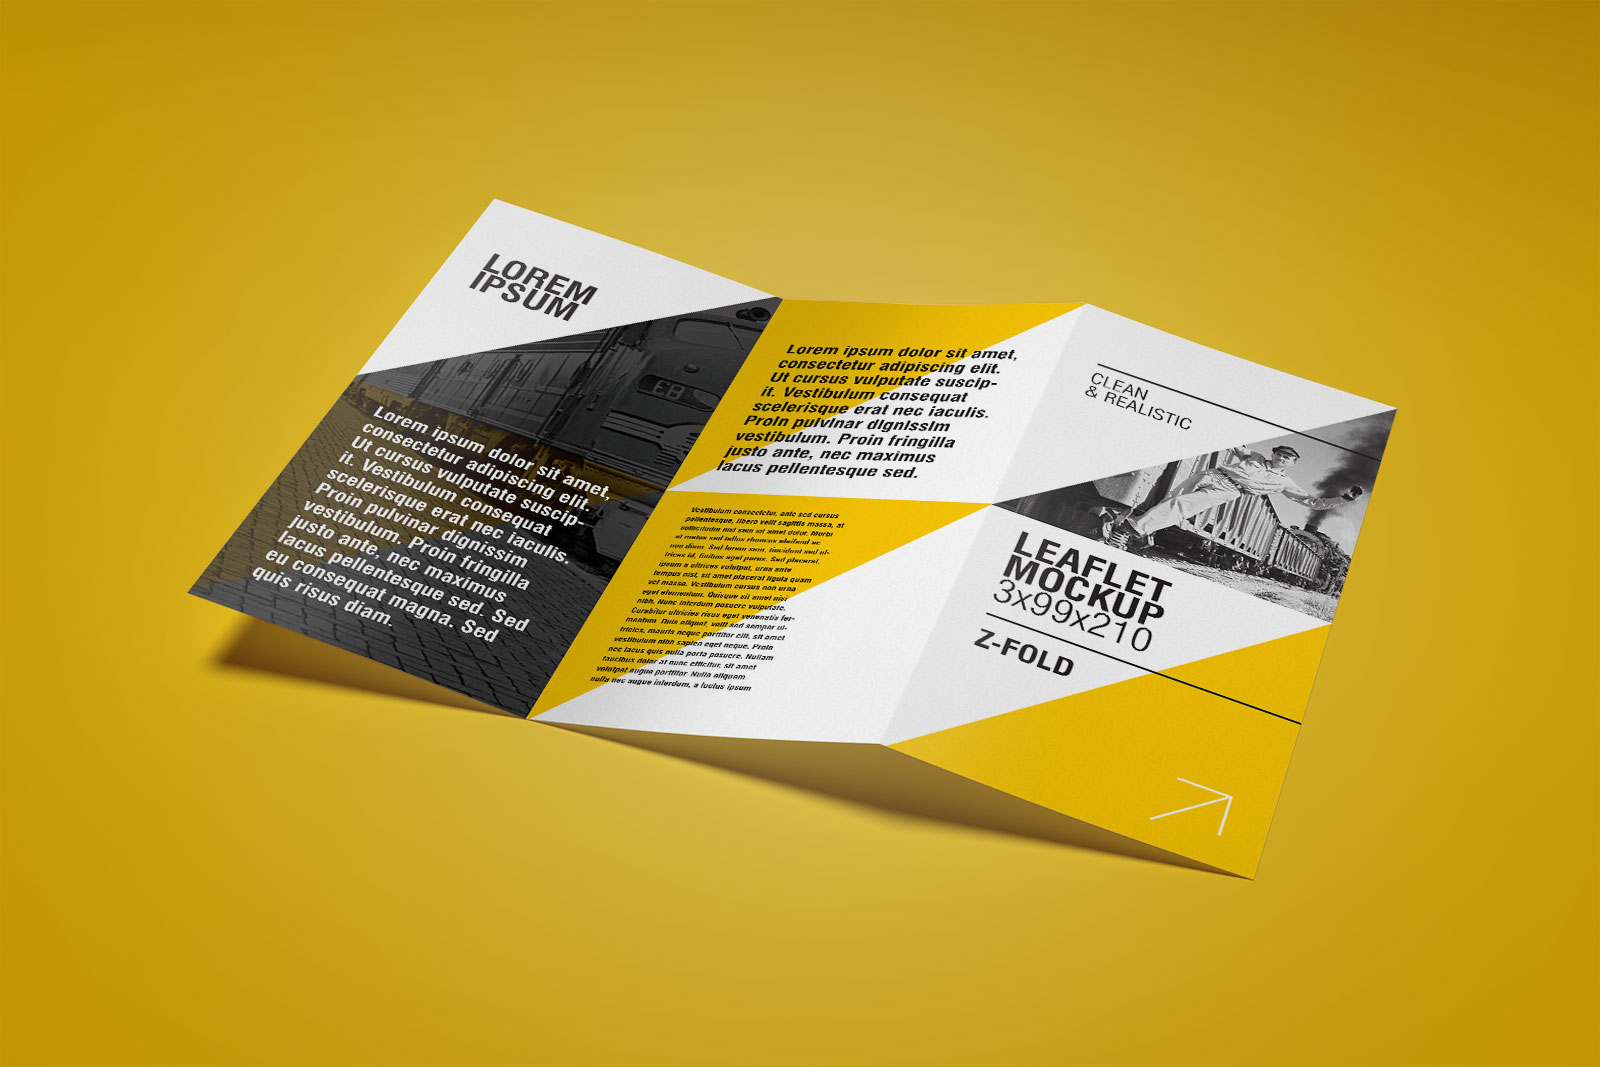 Free-Z-Fold-Brochure-Mockup-PSD-file-4